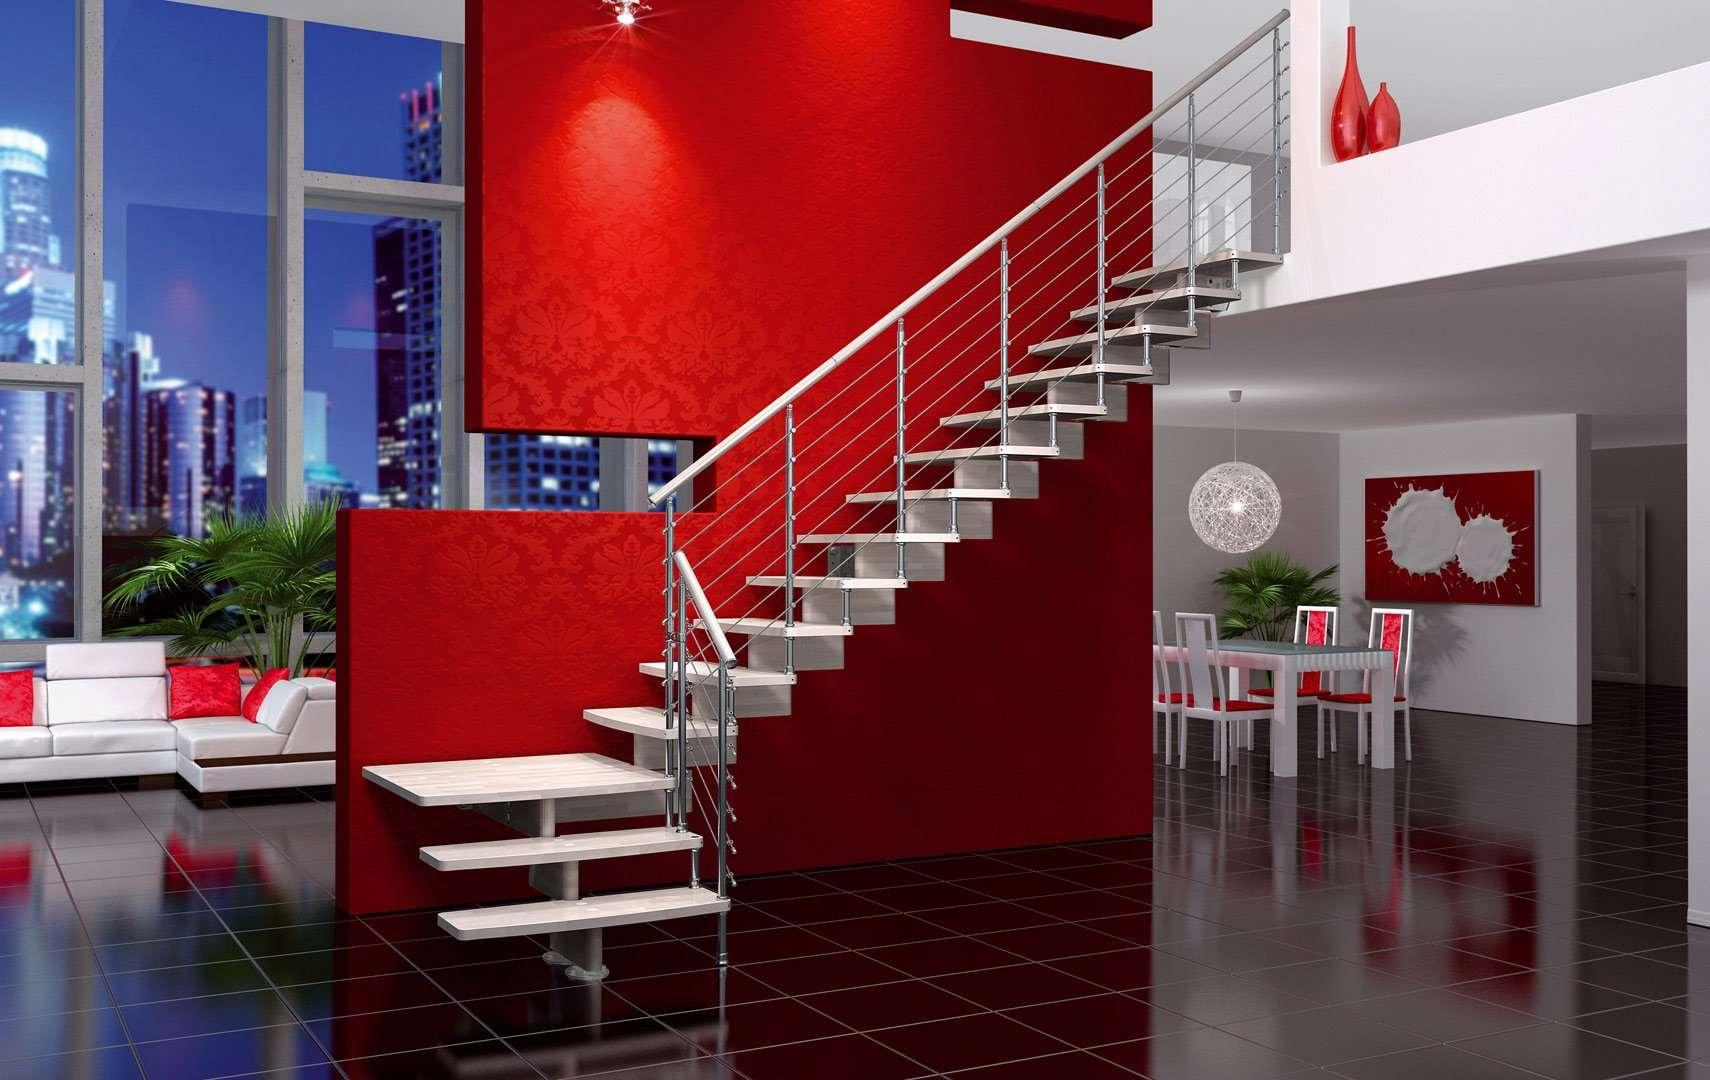 Escaleras italianas escaleras de madera maciza - Escaleras de interior modernas ...